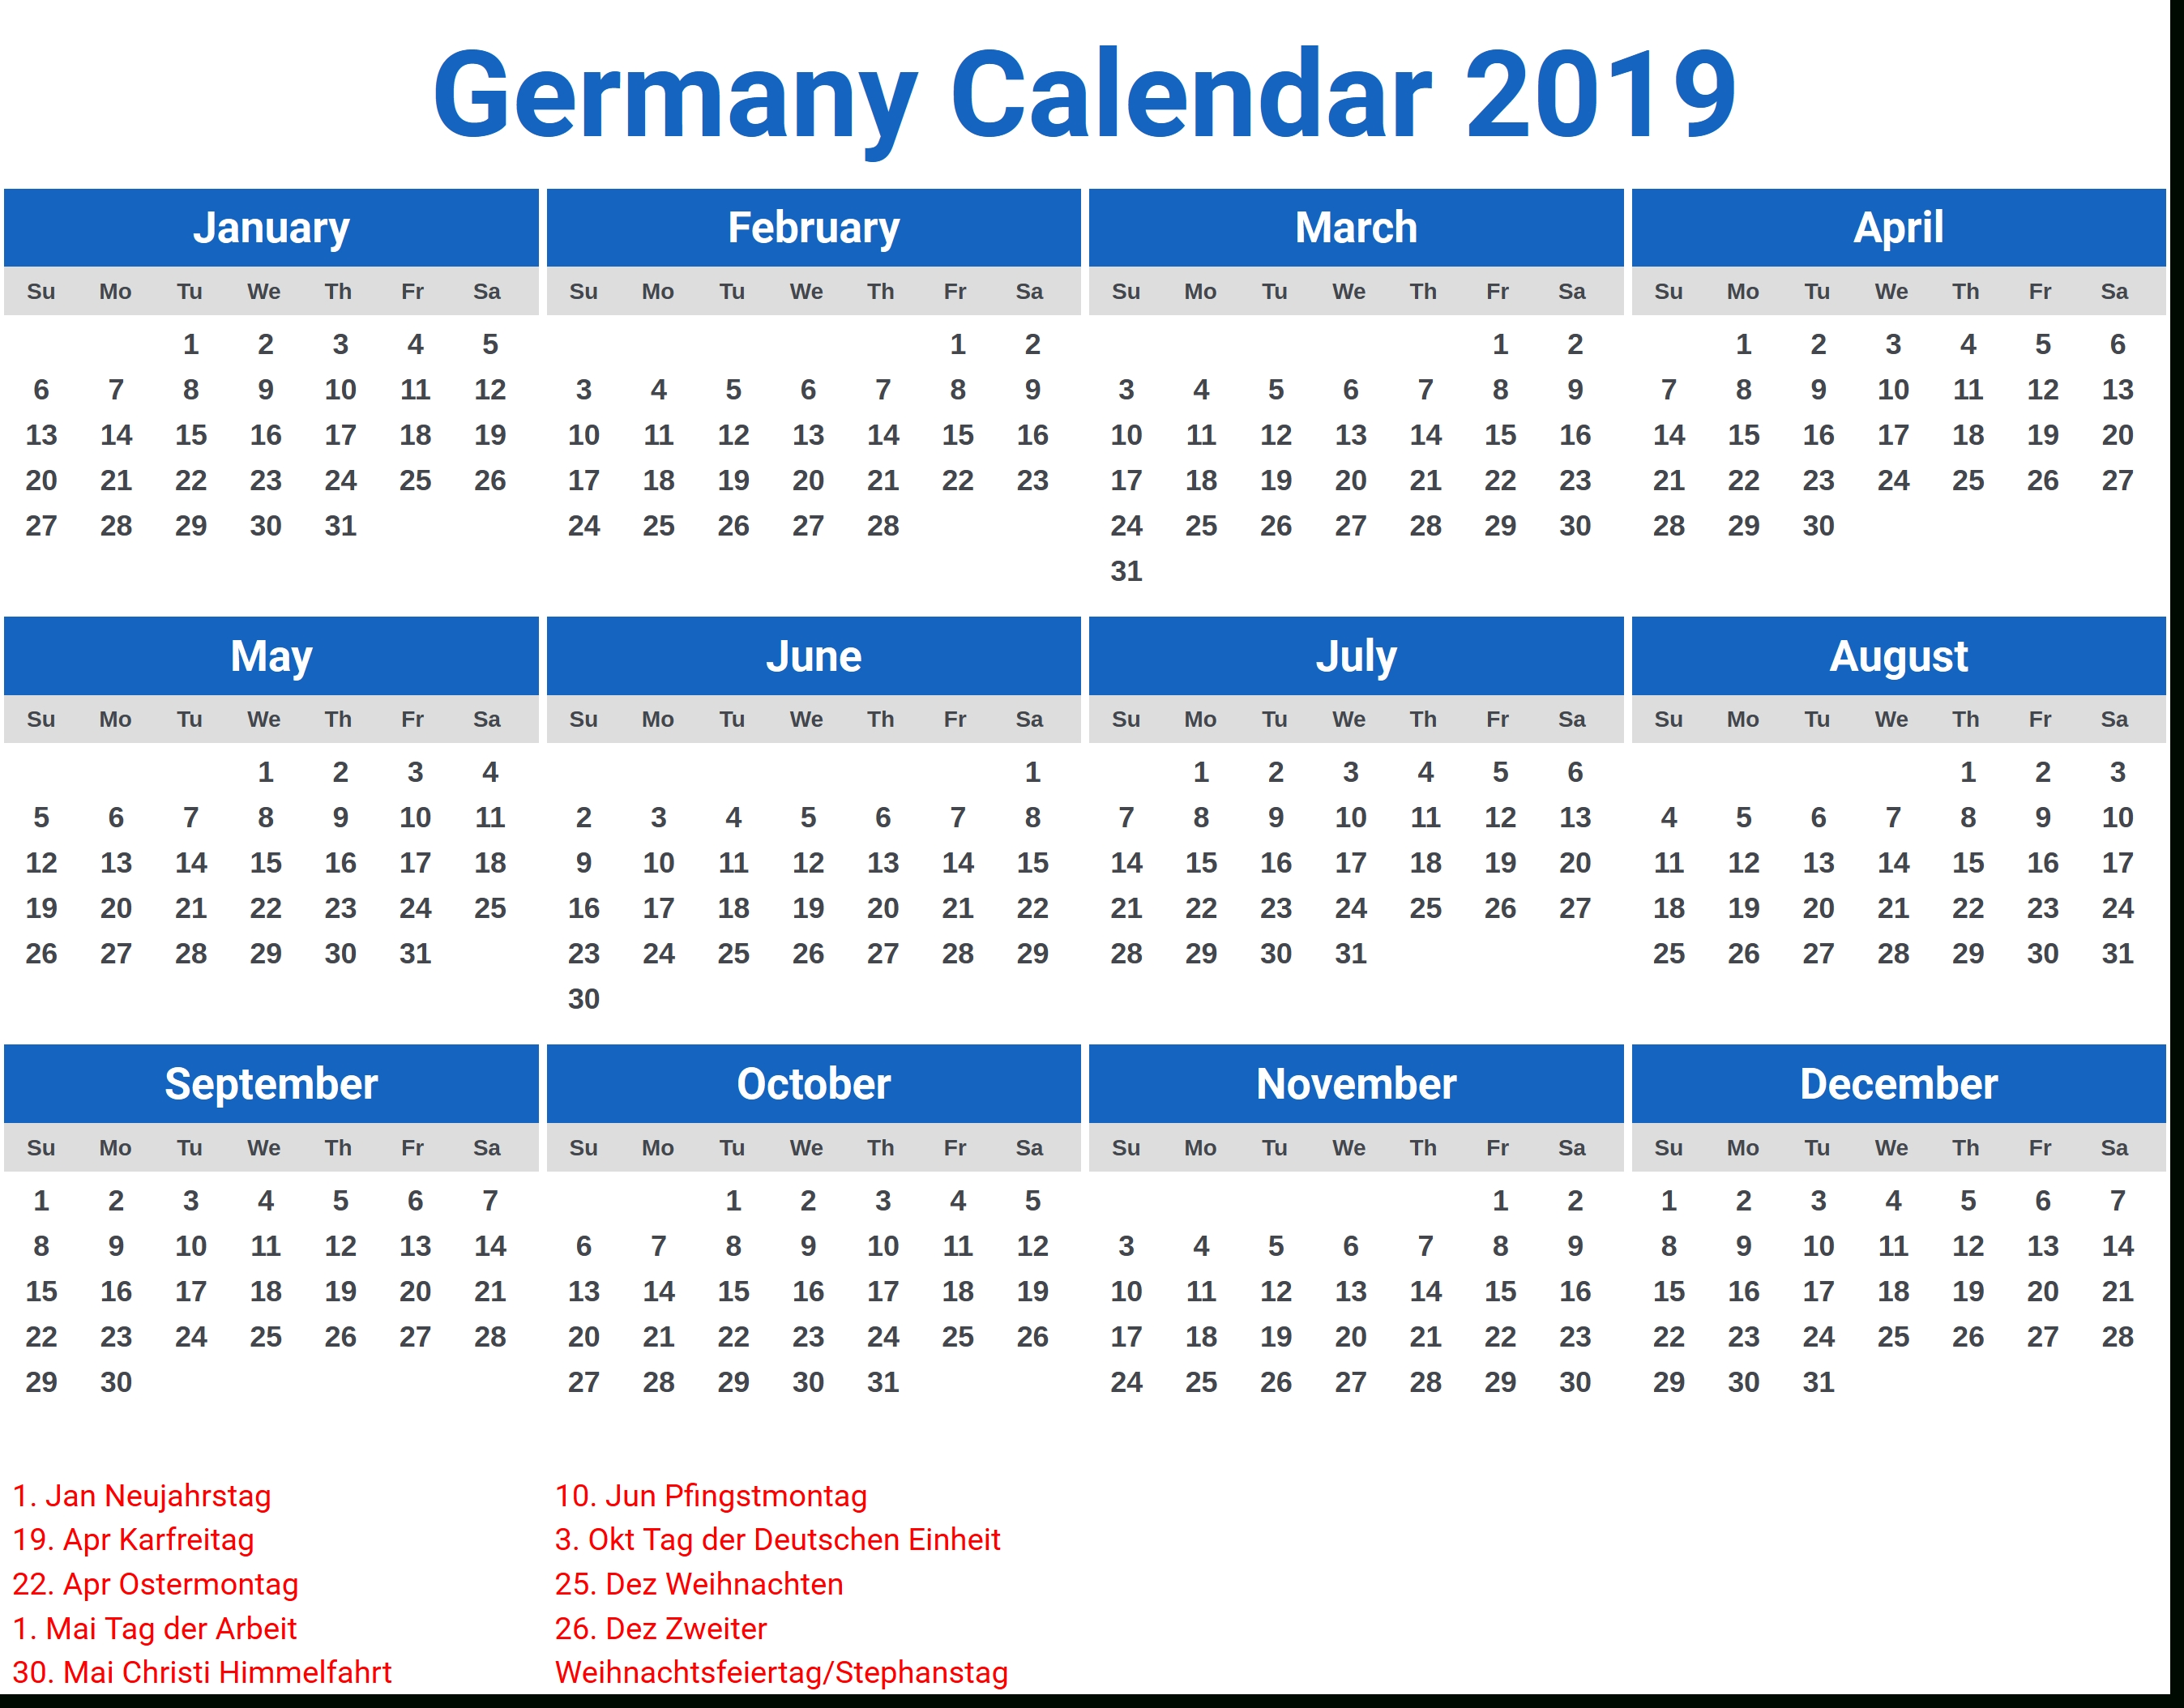 Germany 2019 Calendar With Holidays   2019 Calendars   Pinterest Calendar 2019 Excel Germany